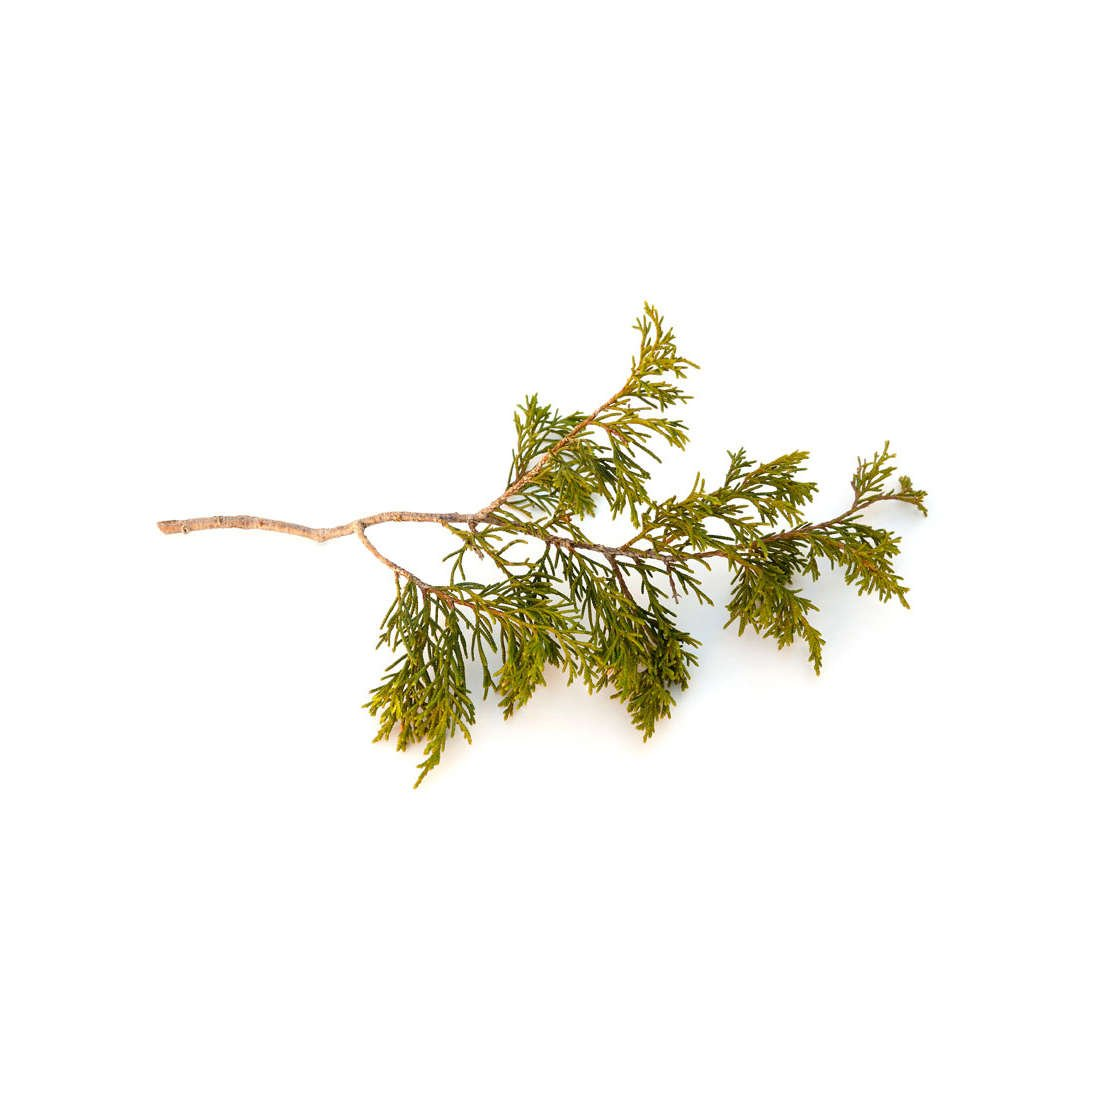 Himalayan Cedarwood essential oil is grounding